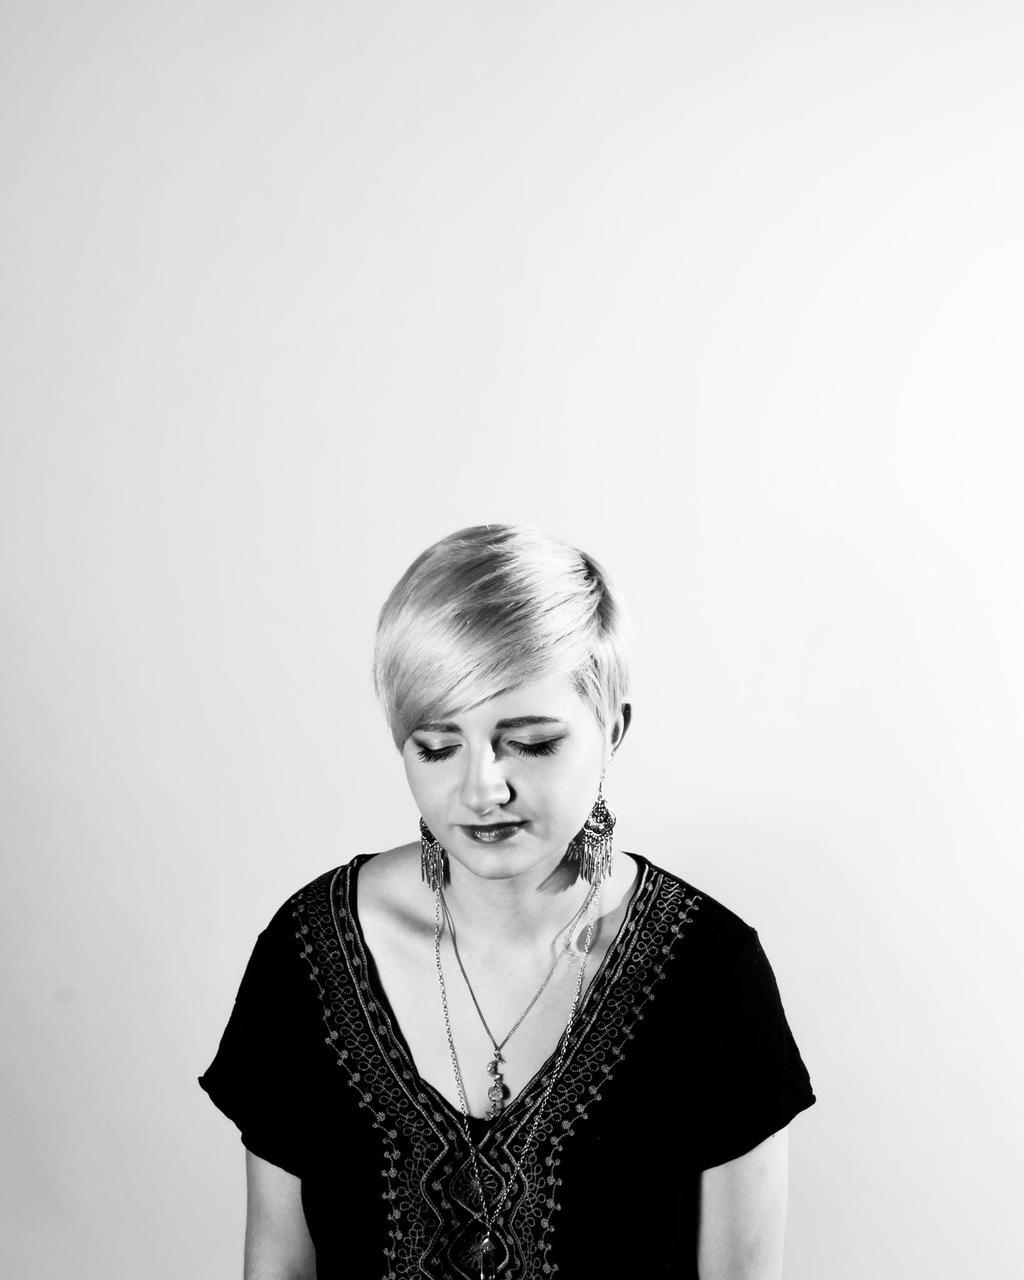 CrystalEquinox's Profile Picture